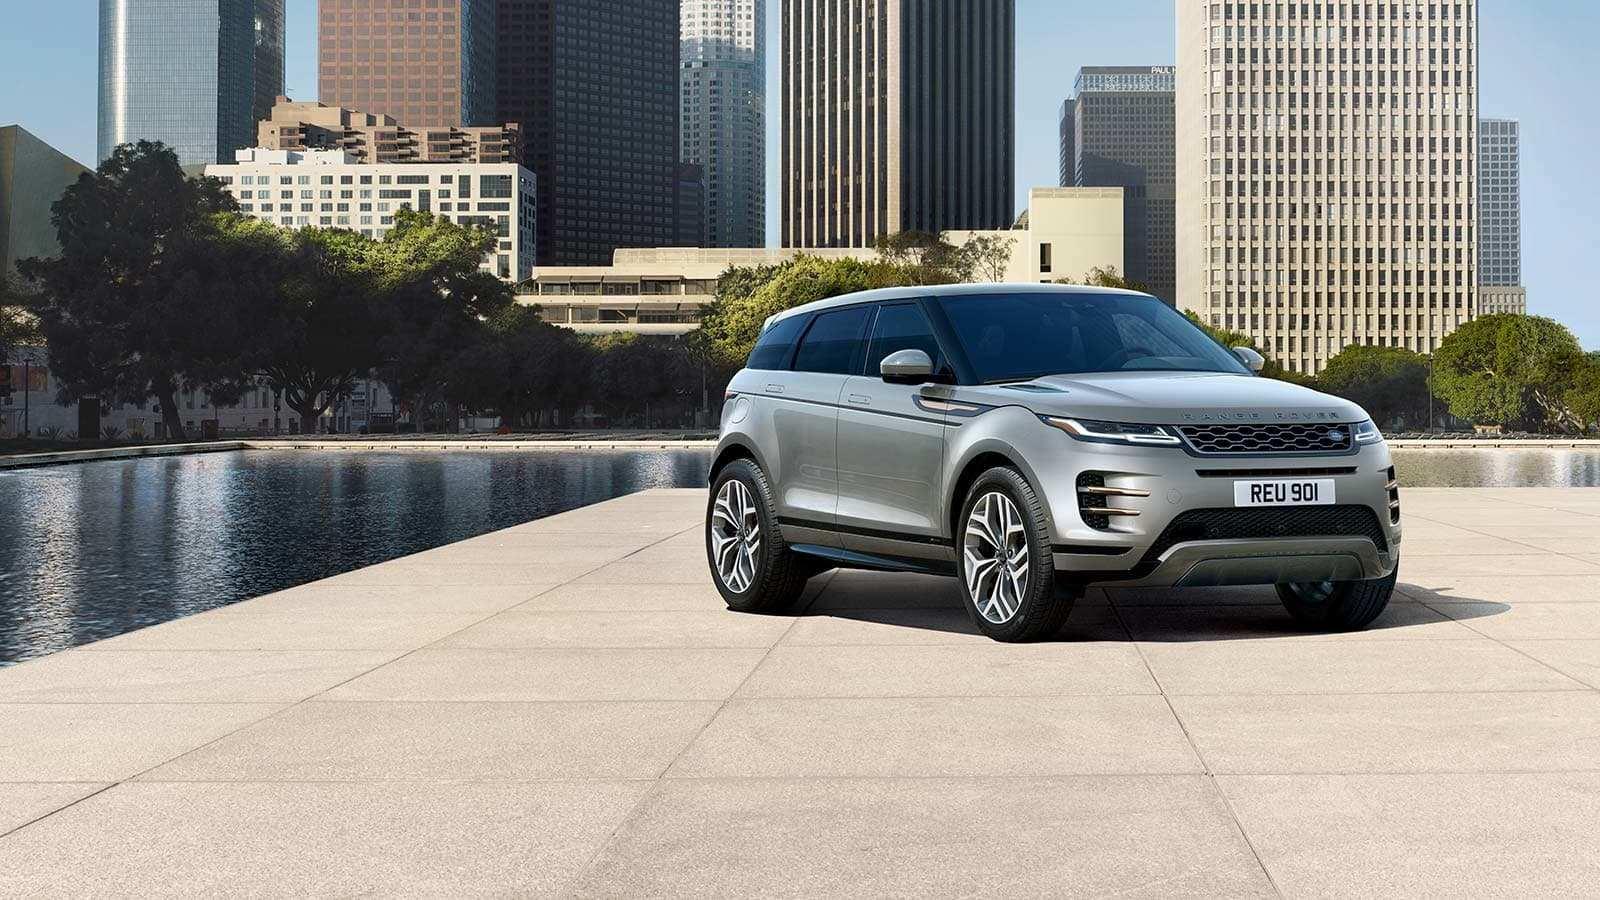 90 New Jaguar Land Rover 2020 Vision Review for Jaguar Land Rover 2020 Vision